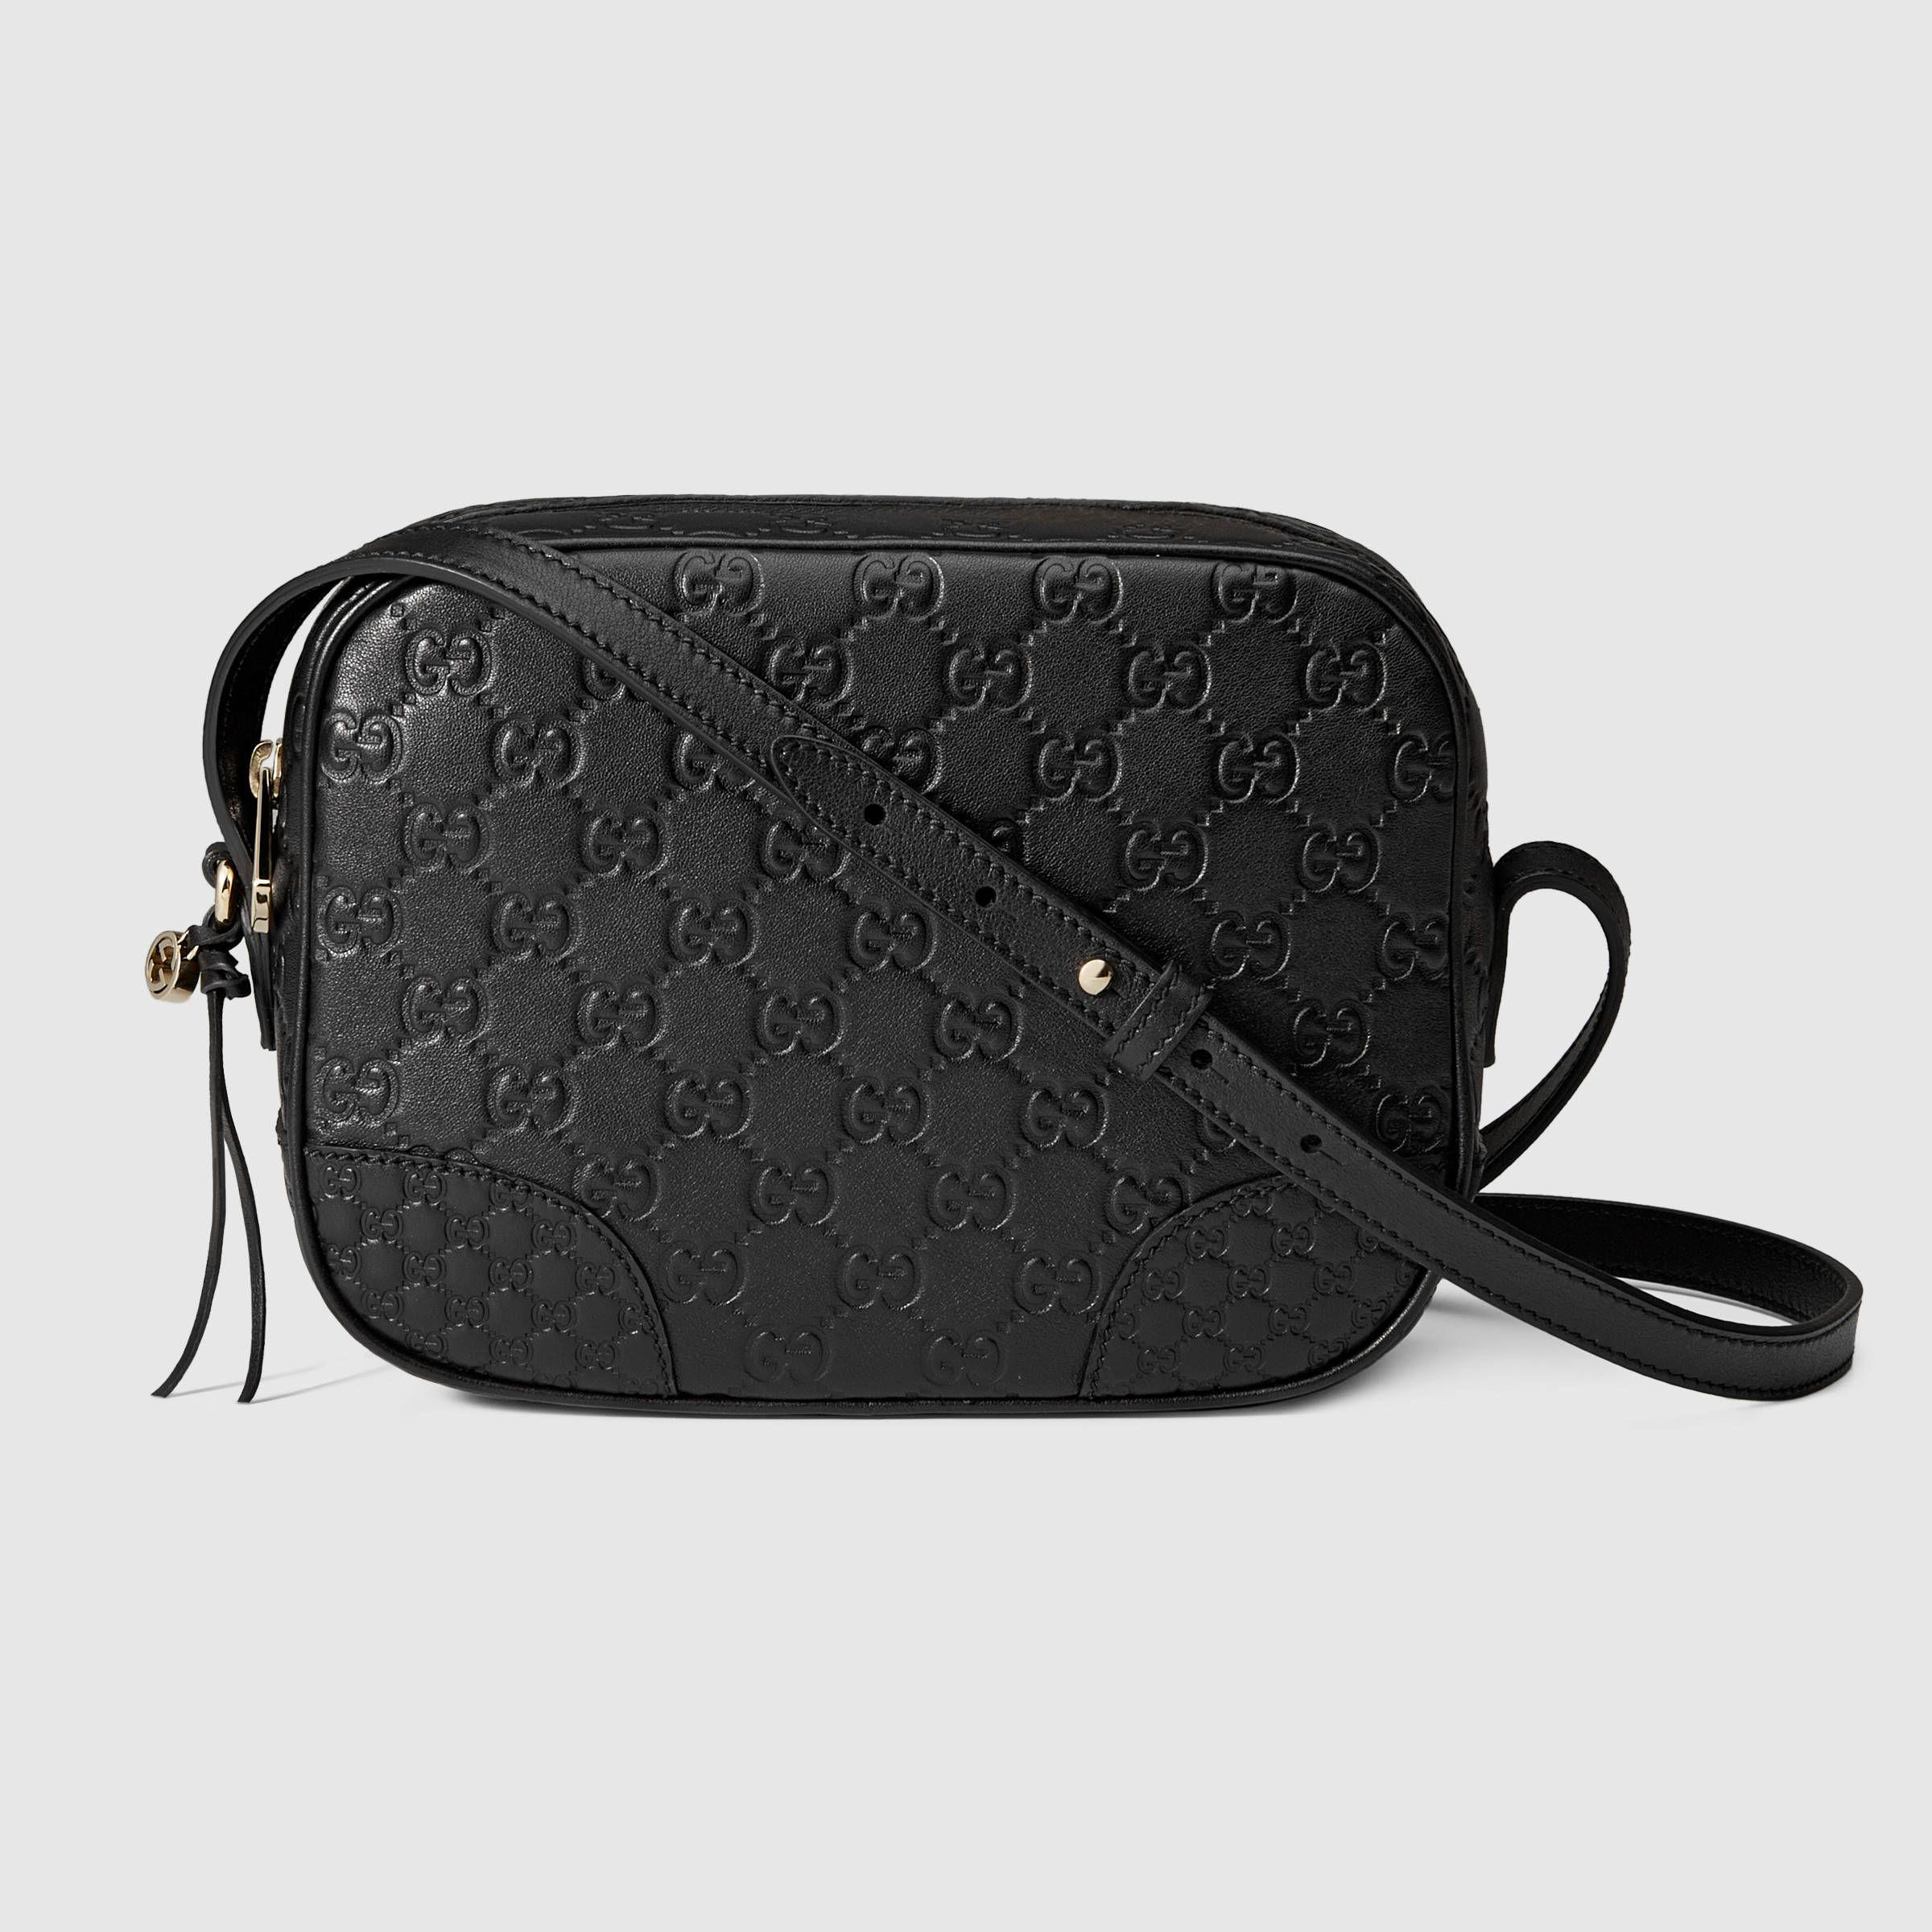 bbc66f6ec679 Gucci Women - Bree Guccissima mini messenger bag - 387360AOOJG1000 ...